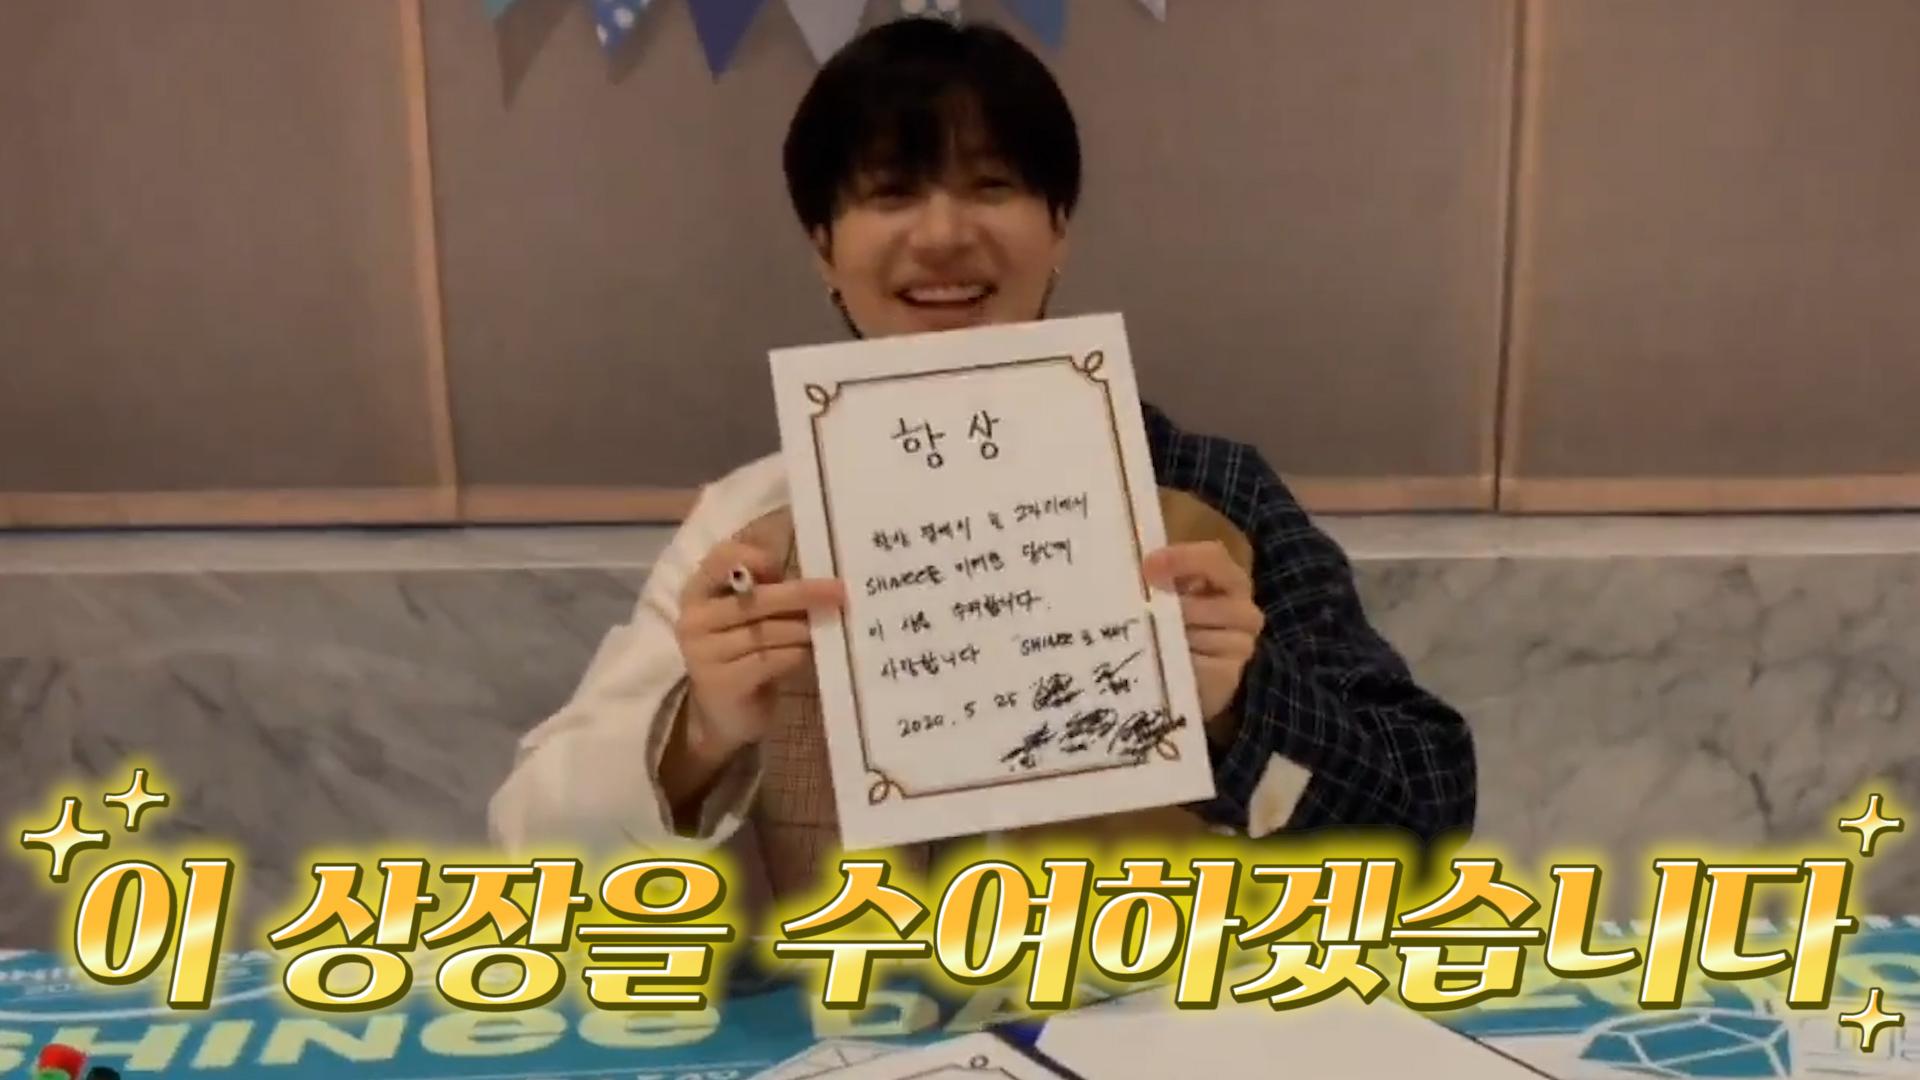 [SHINee] 사람은 하나인데~ 싸인은 다섯 개~ 6v6🎶 (Congratulations on SHINee's 12th Anniversary!)